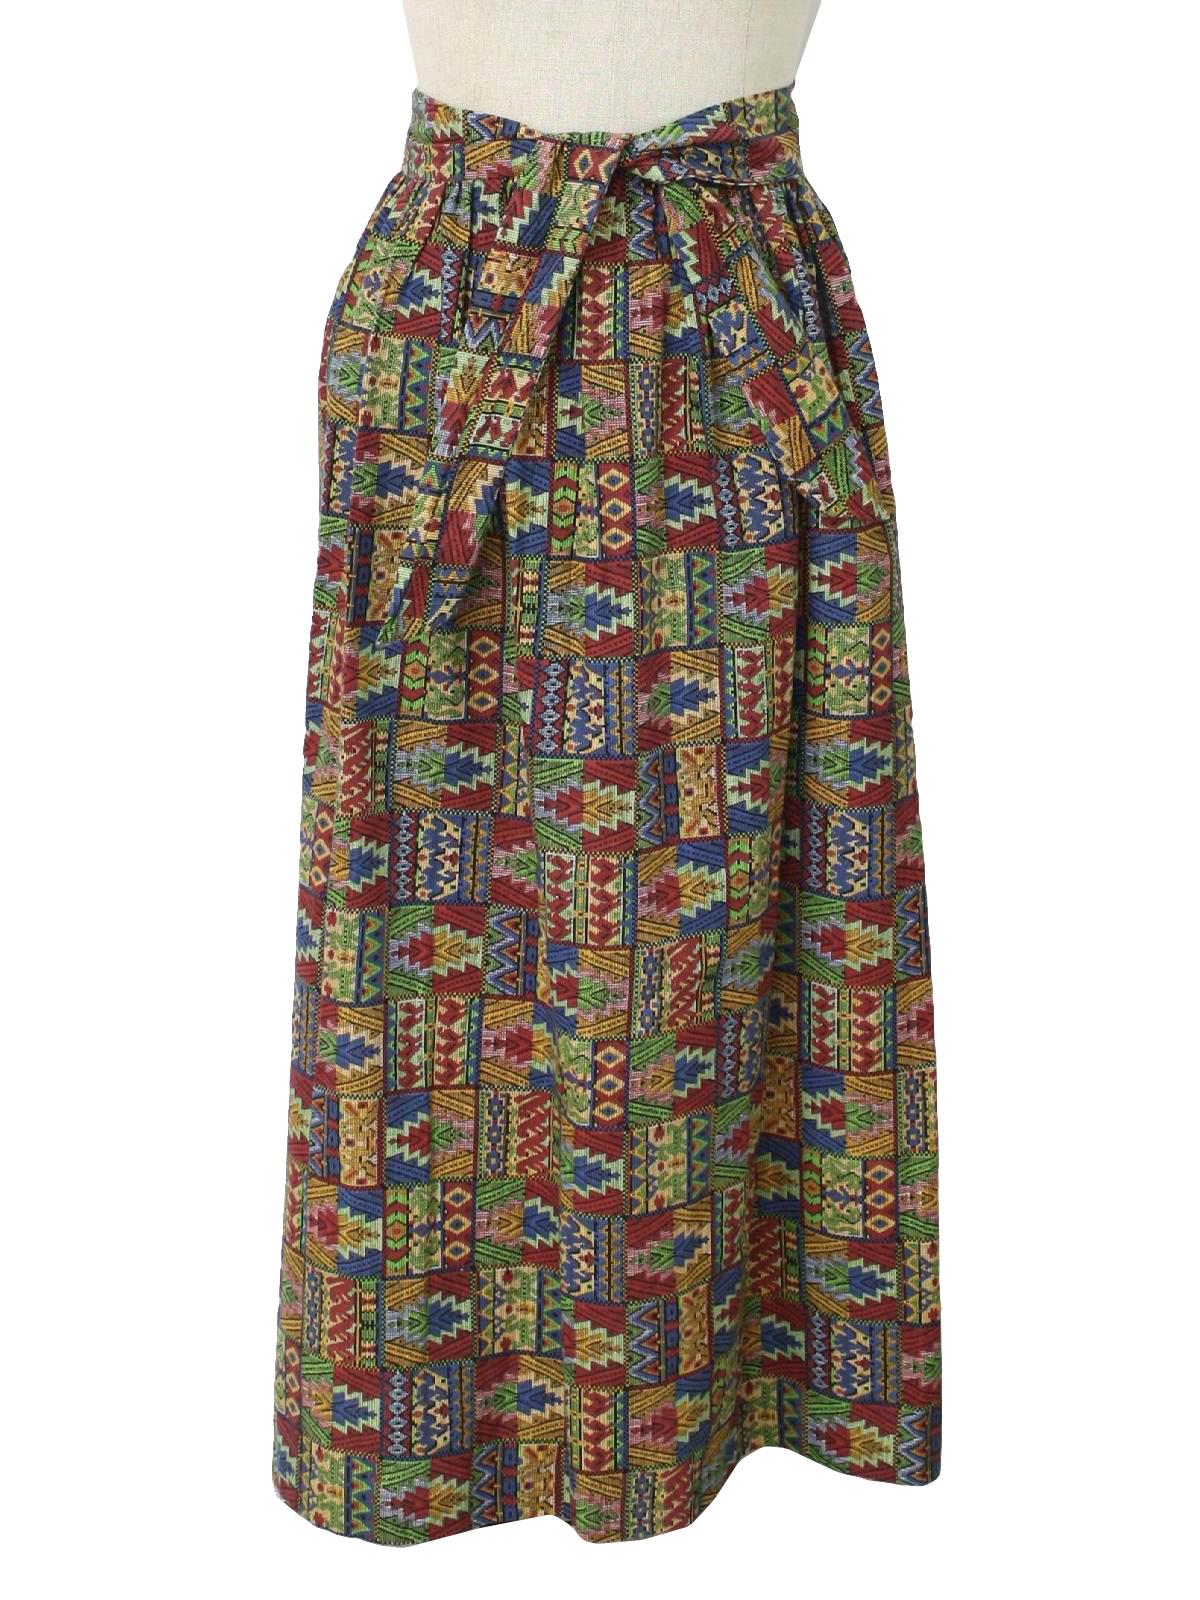 Gypsy Skirts